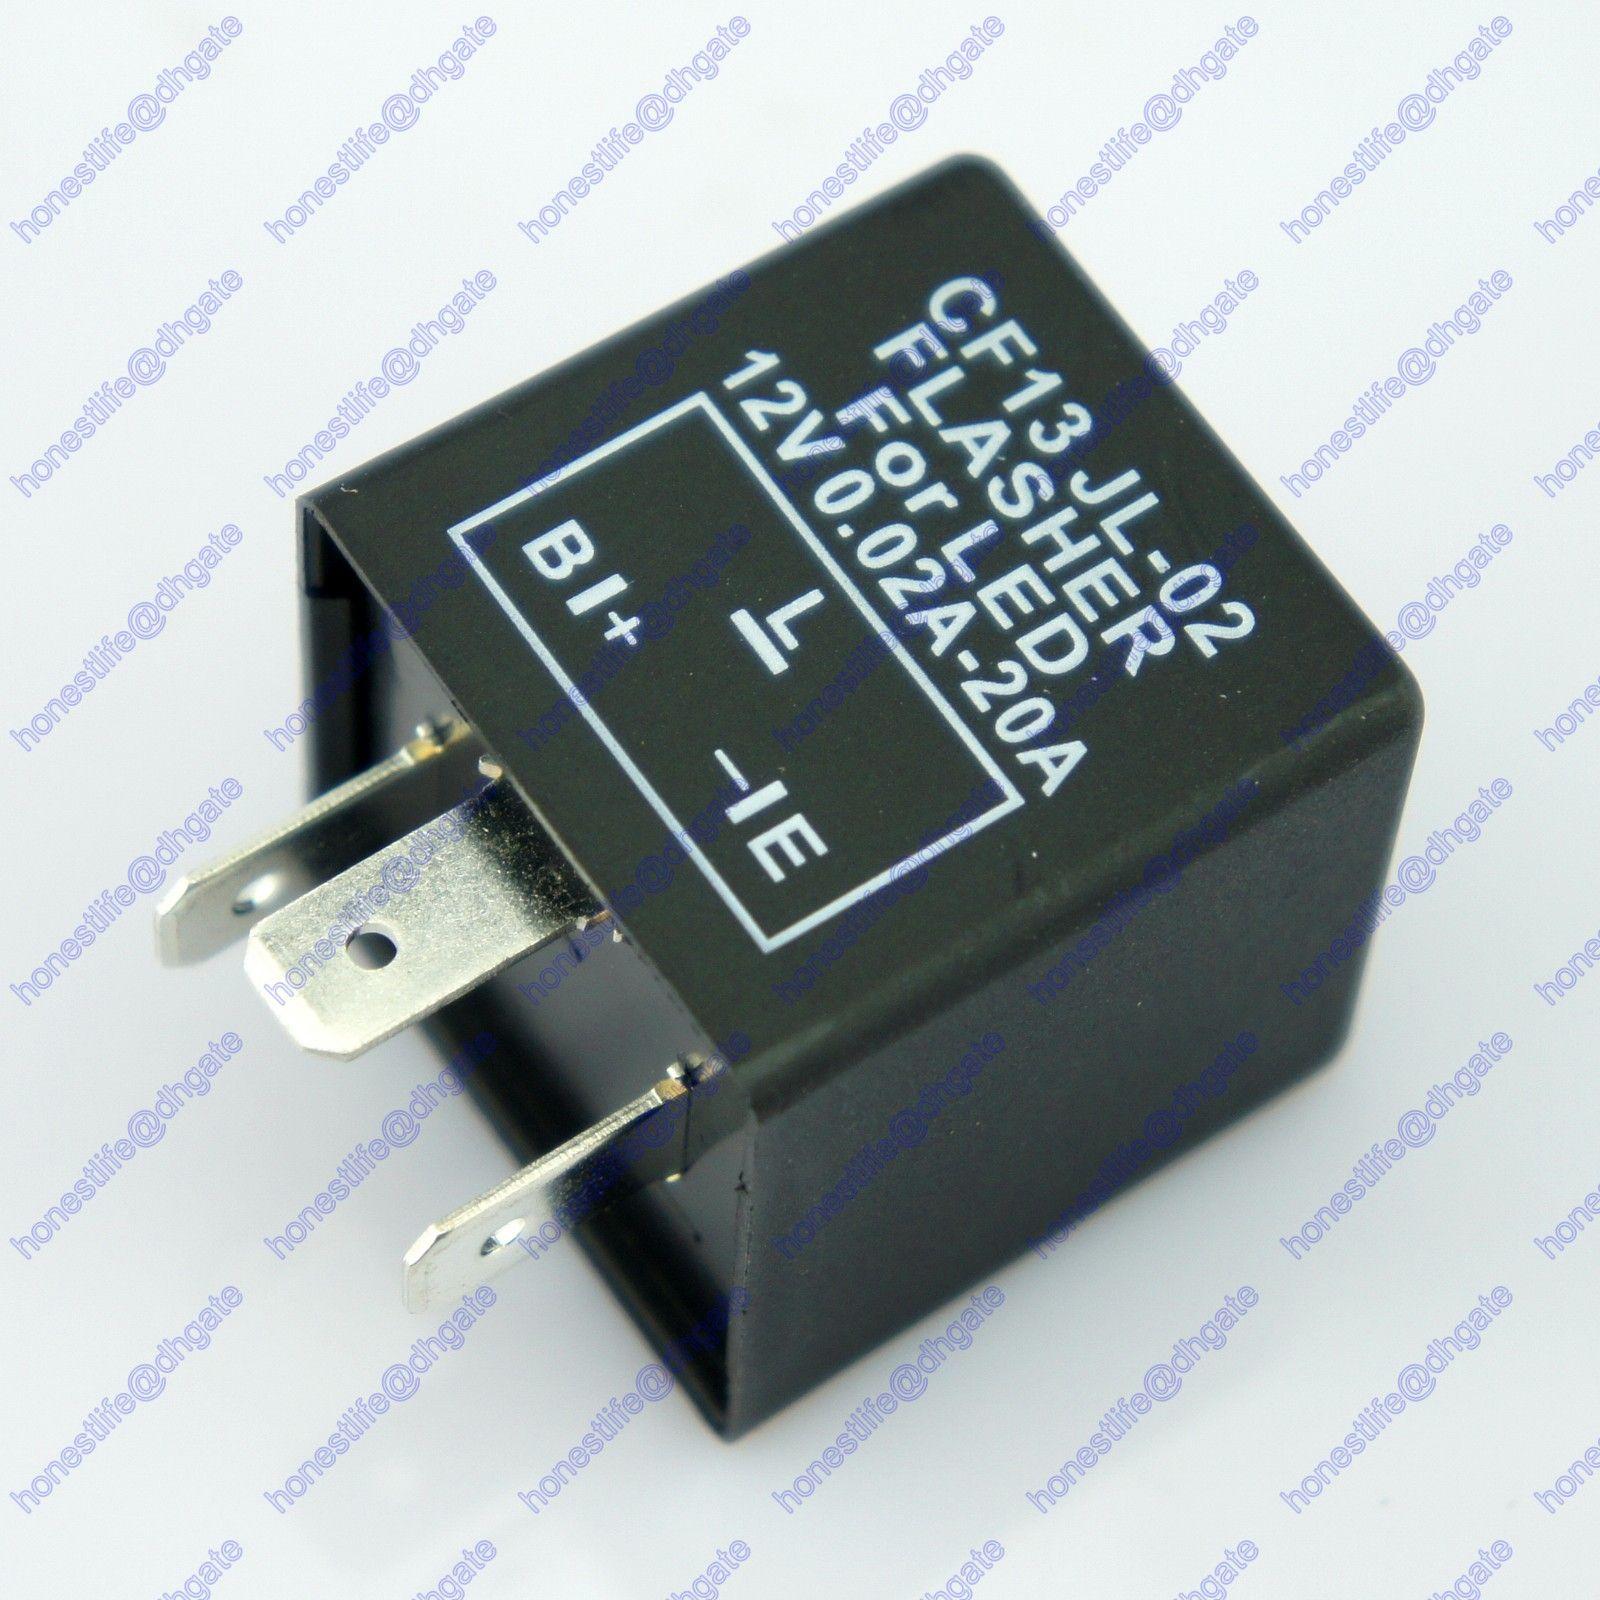 30 4 Pin Relay Wiring Diagram Furthermore 5 Pin Relay Wiring Diagram